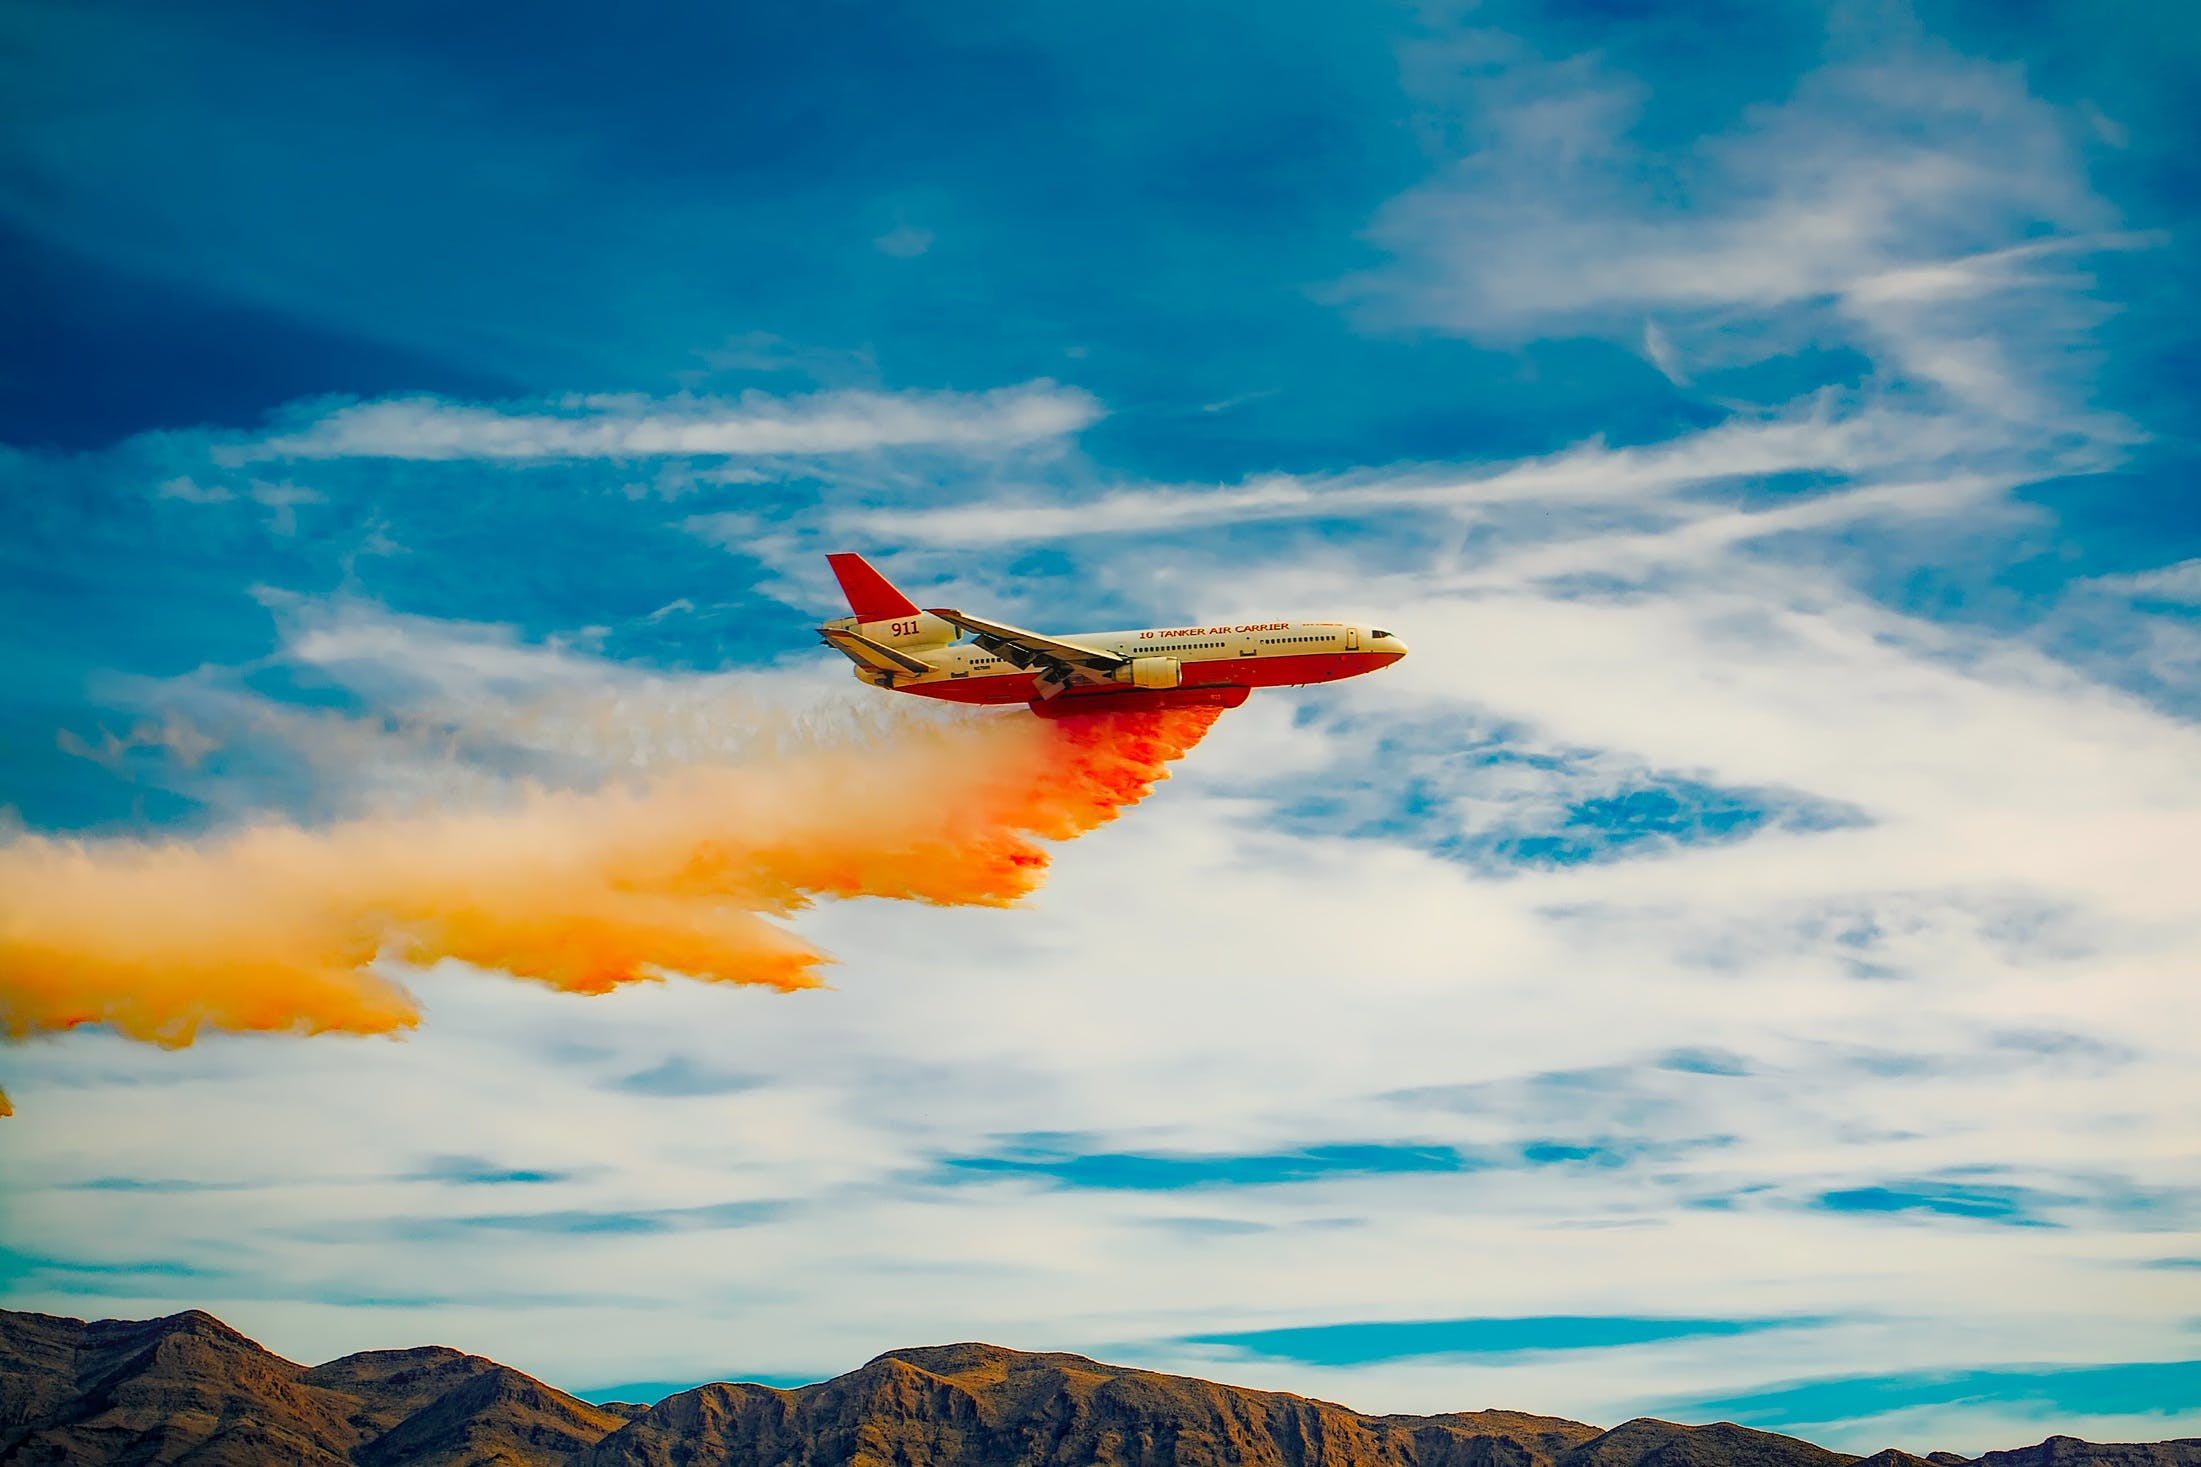 White and Red Passenger Airplane Under White Sky